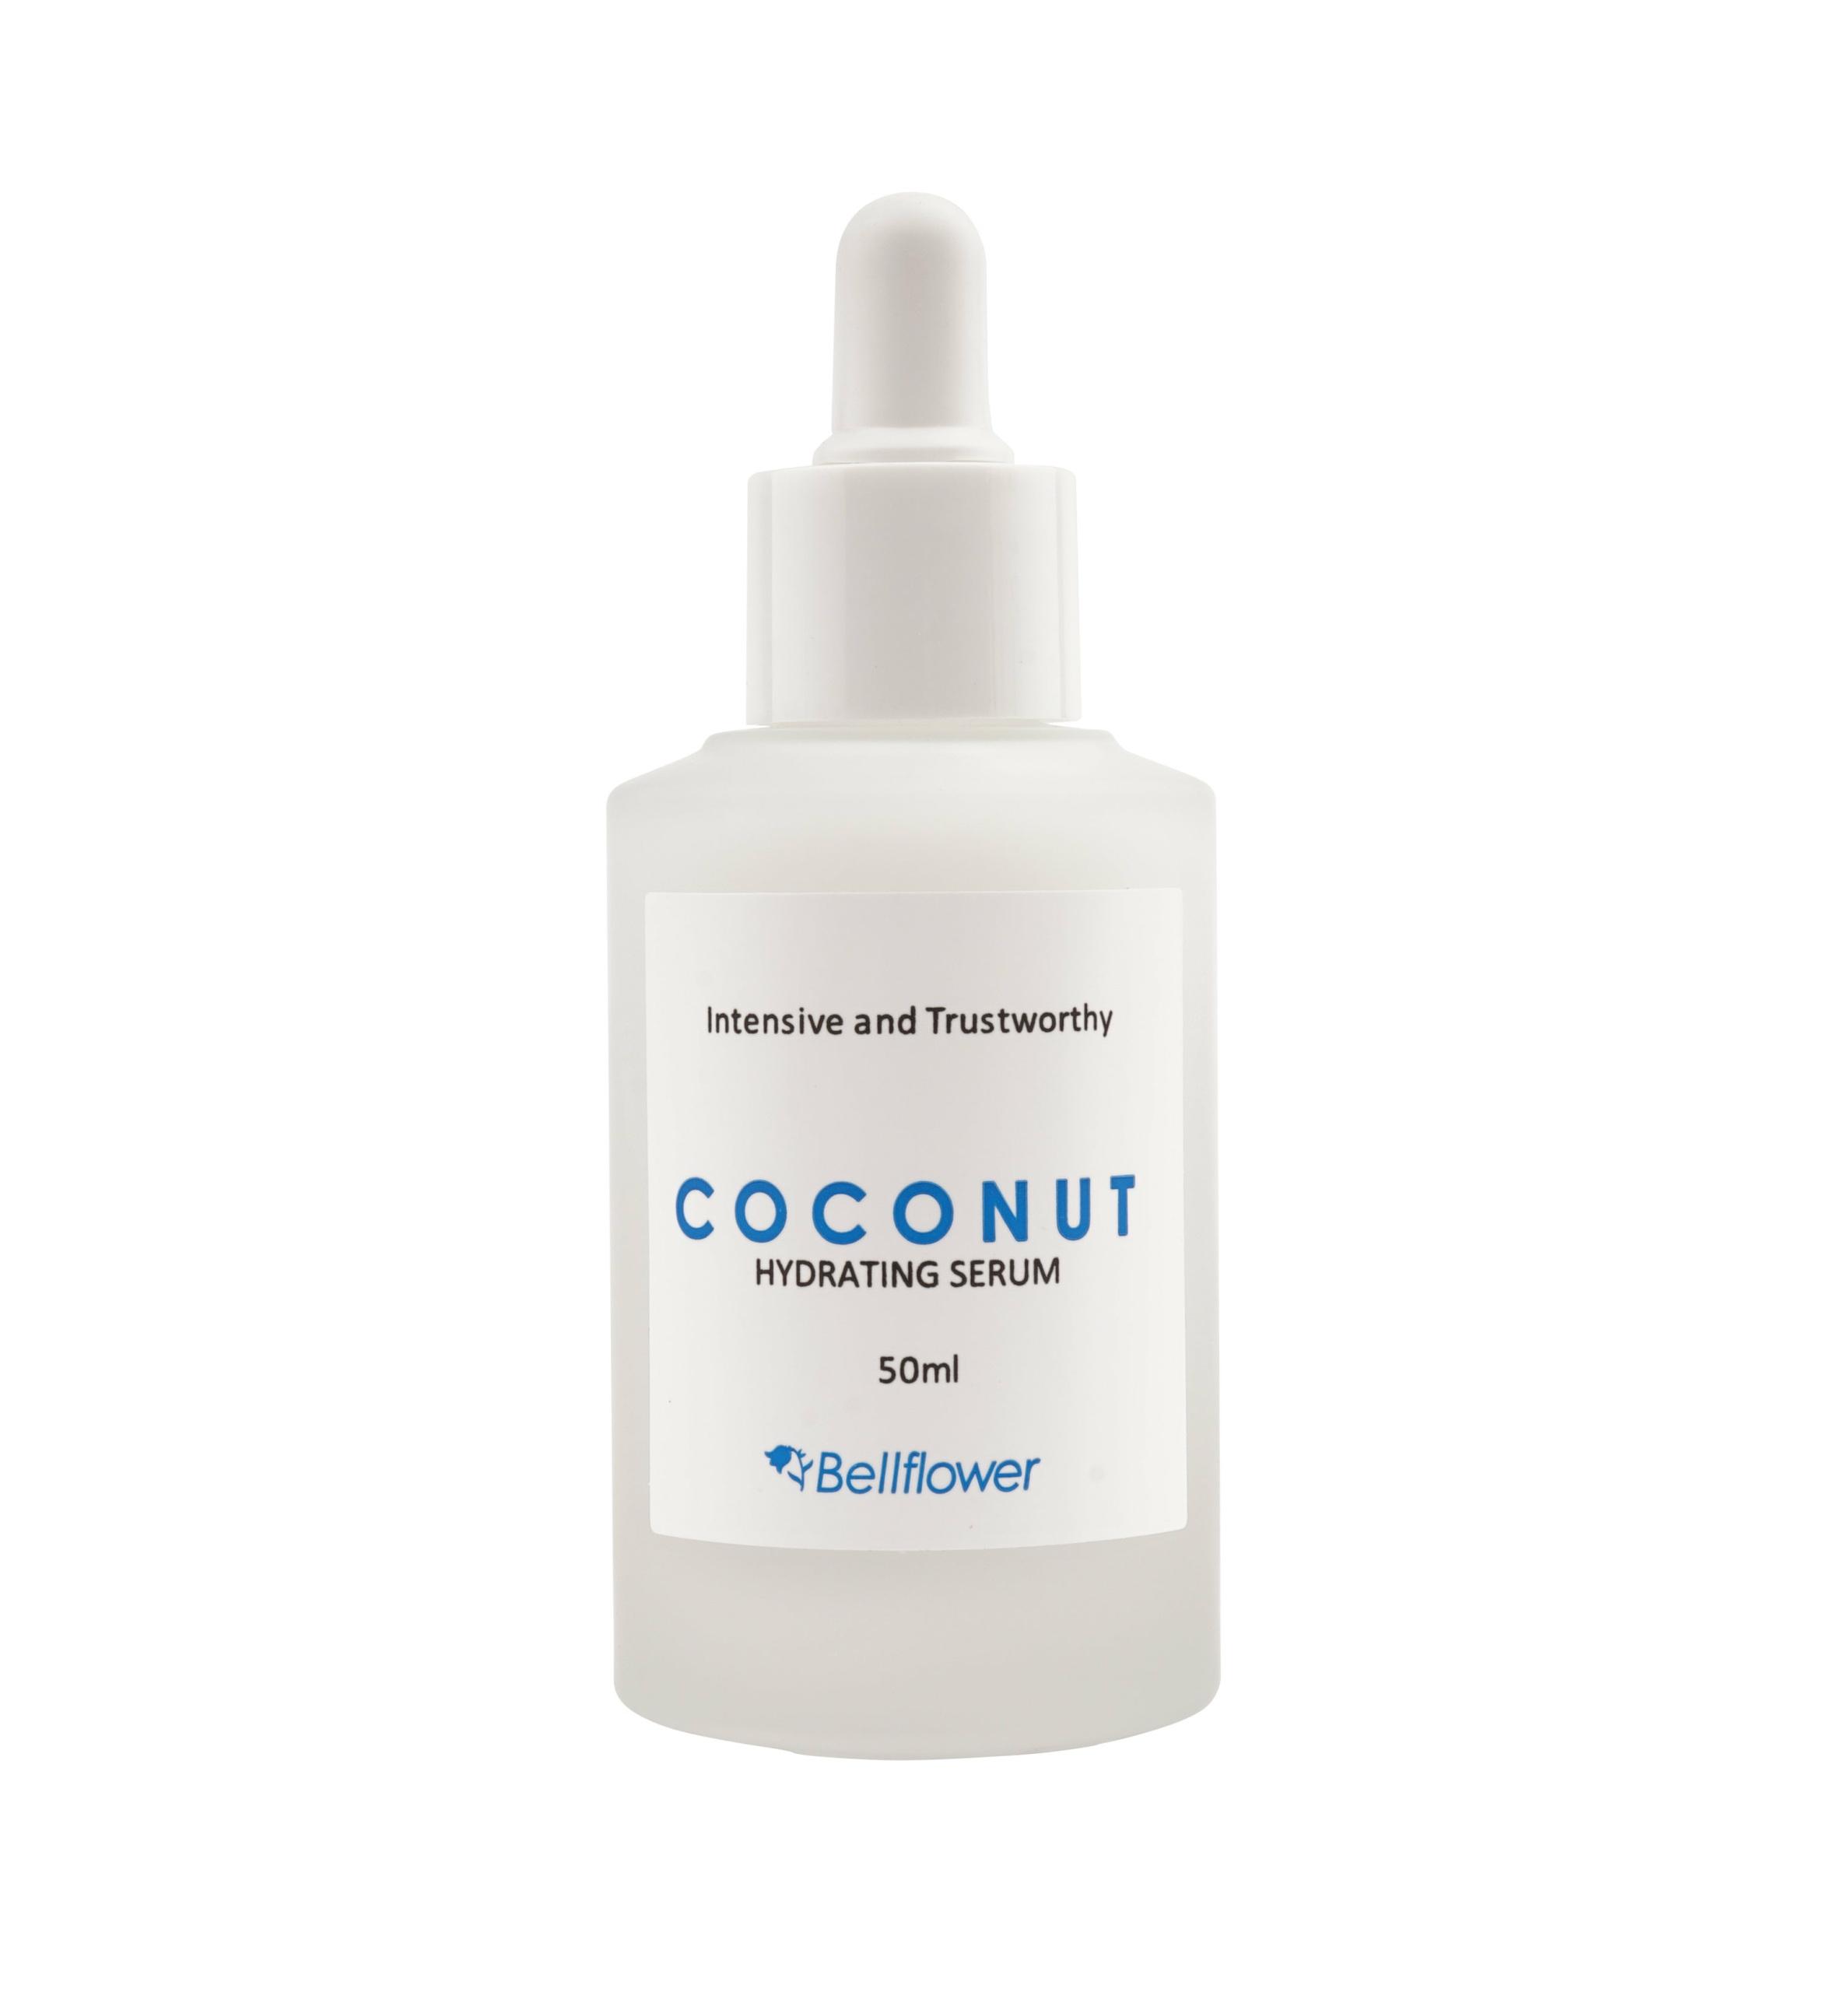 Bellflower Coconut Hydrating Serum 50ml